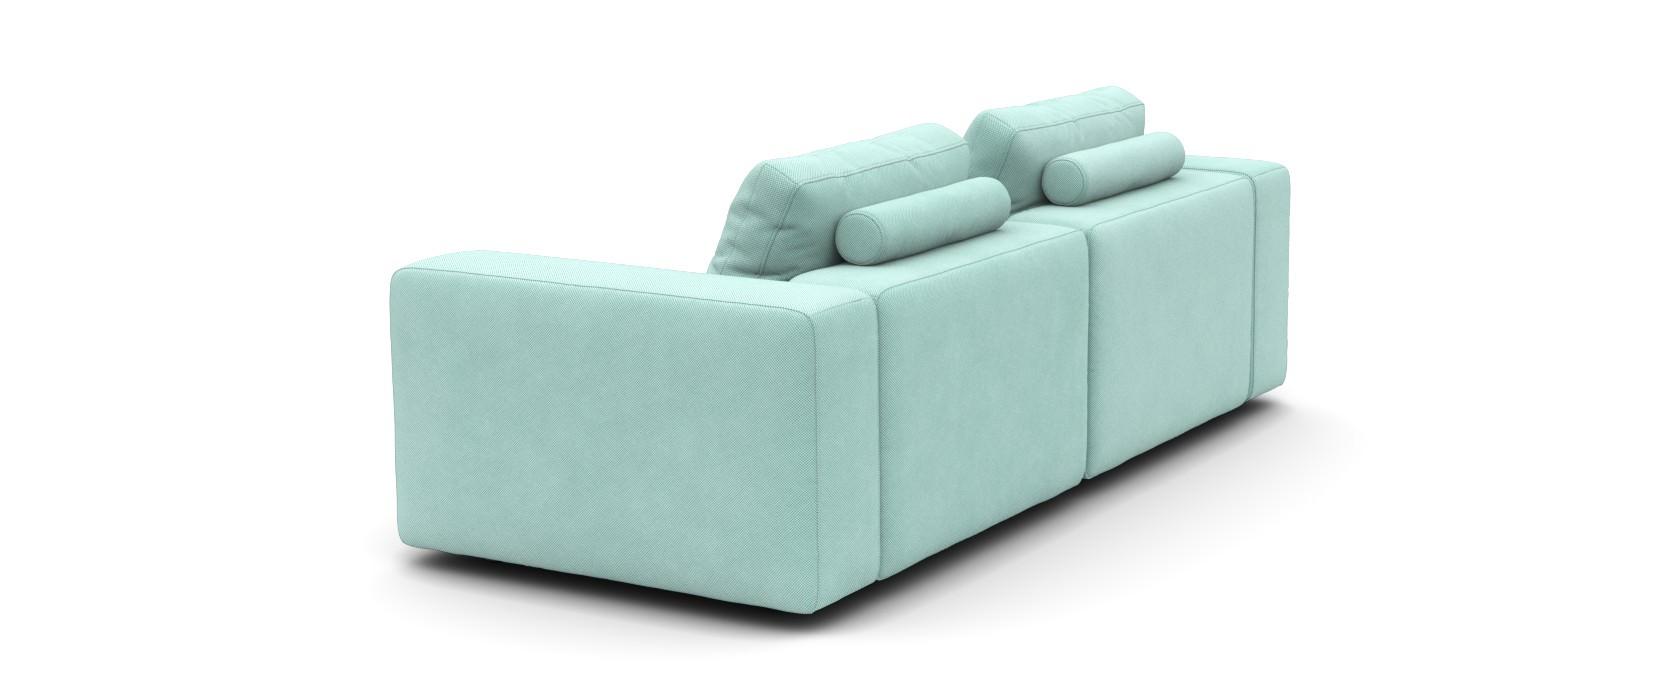 2-Sitzer Sofa Domino